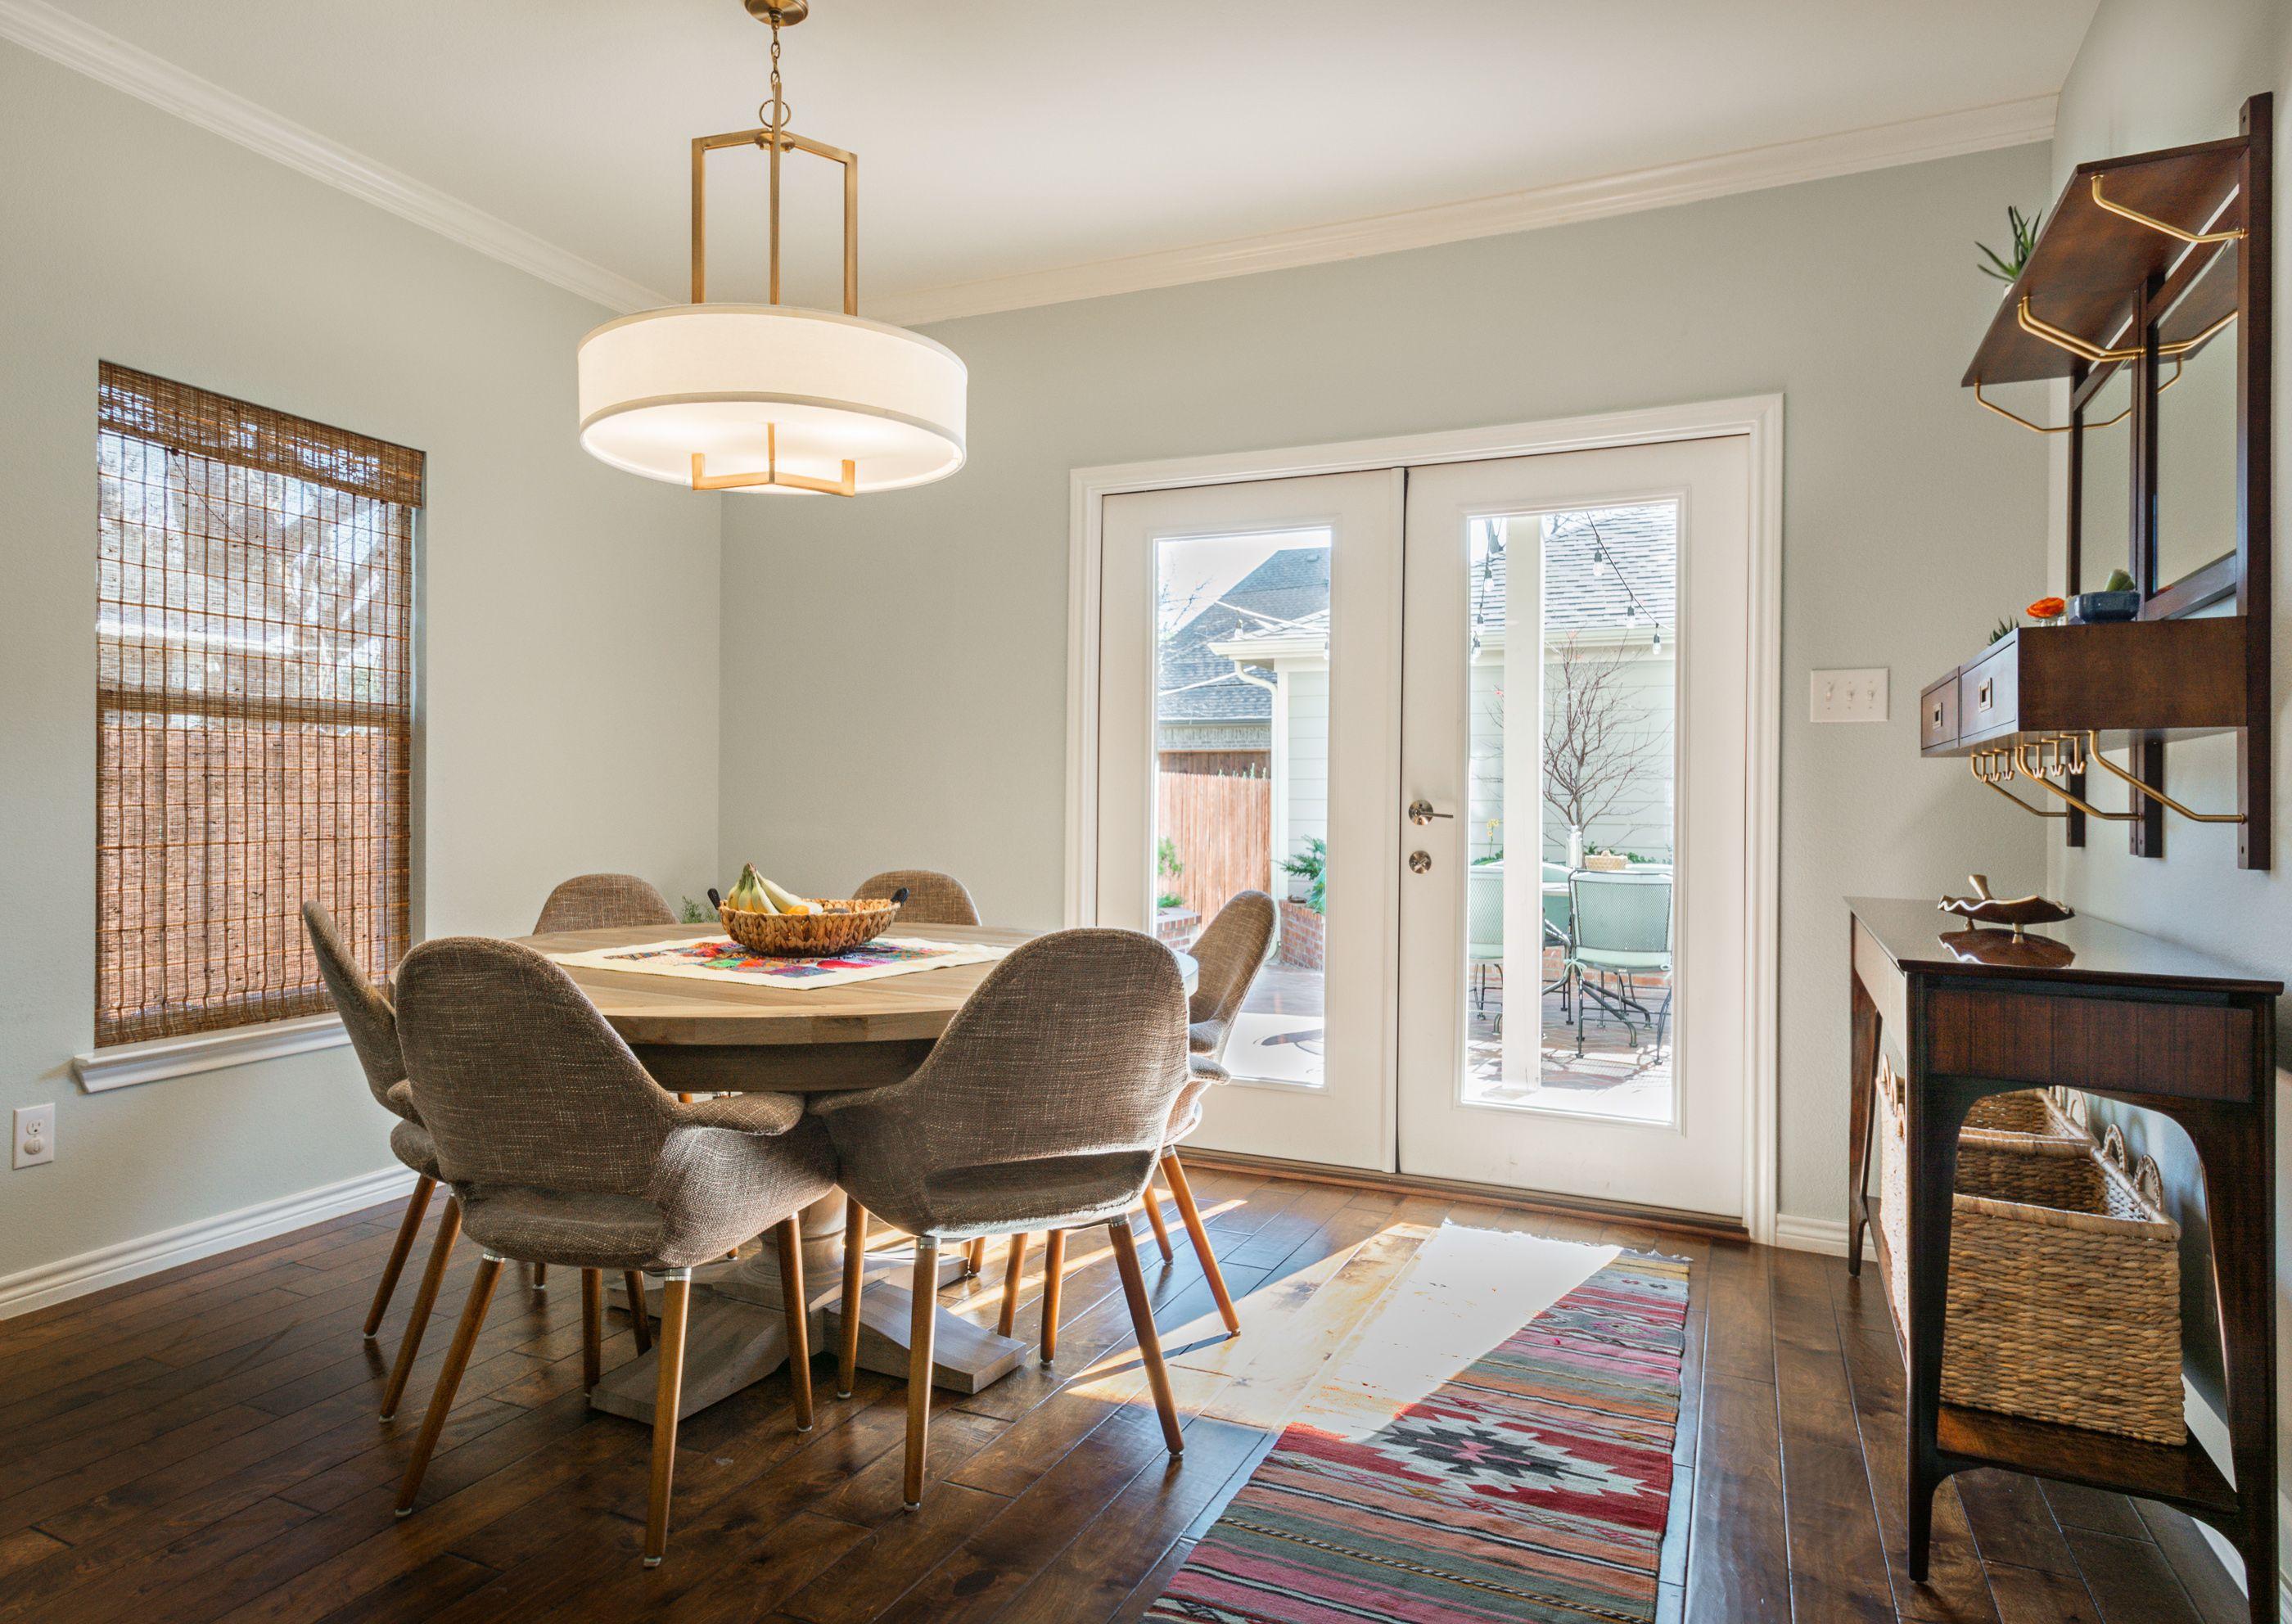 Dining Room Fort Worth Tx Photography By Dm Design Kara Gordon Of Sleek To Chic Interiors Llc